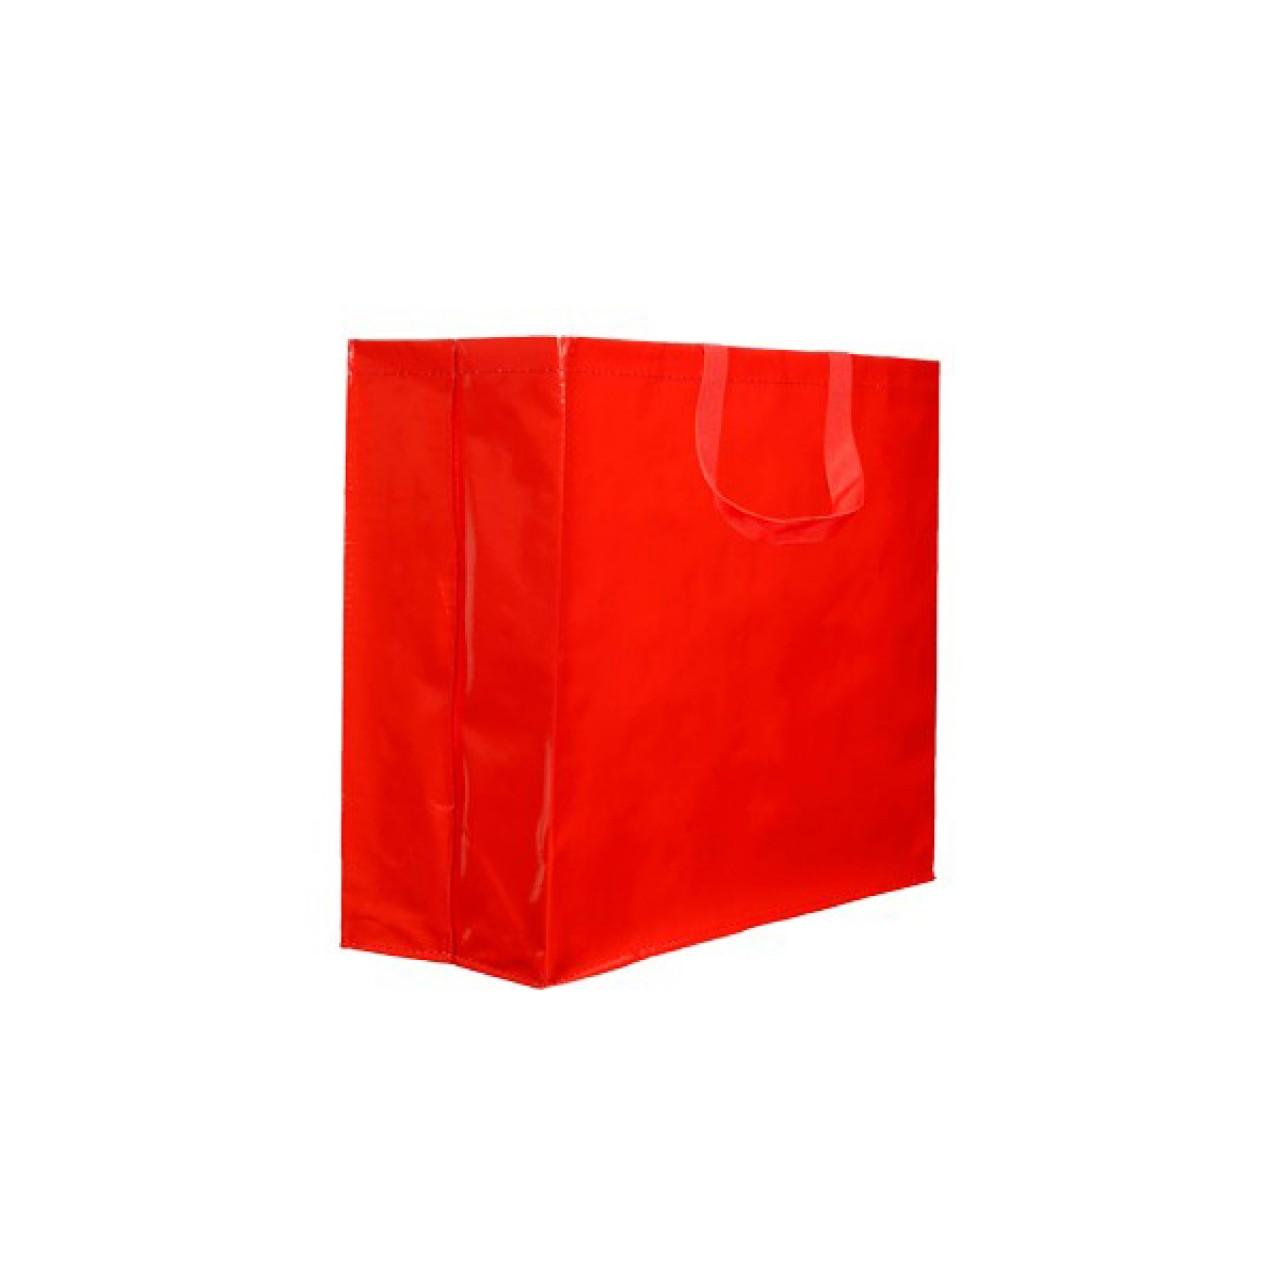 Shopping Bag UBAG ORLANDO Κόκκινη - 3308